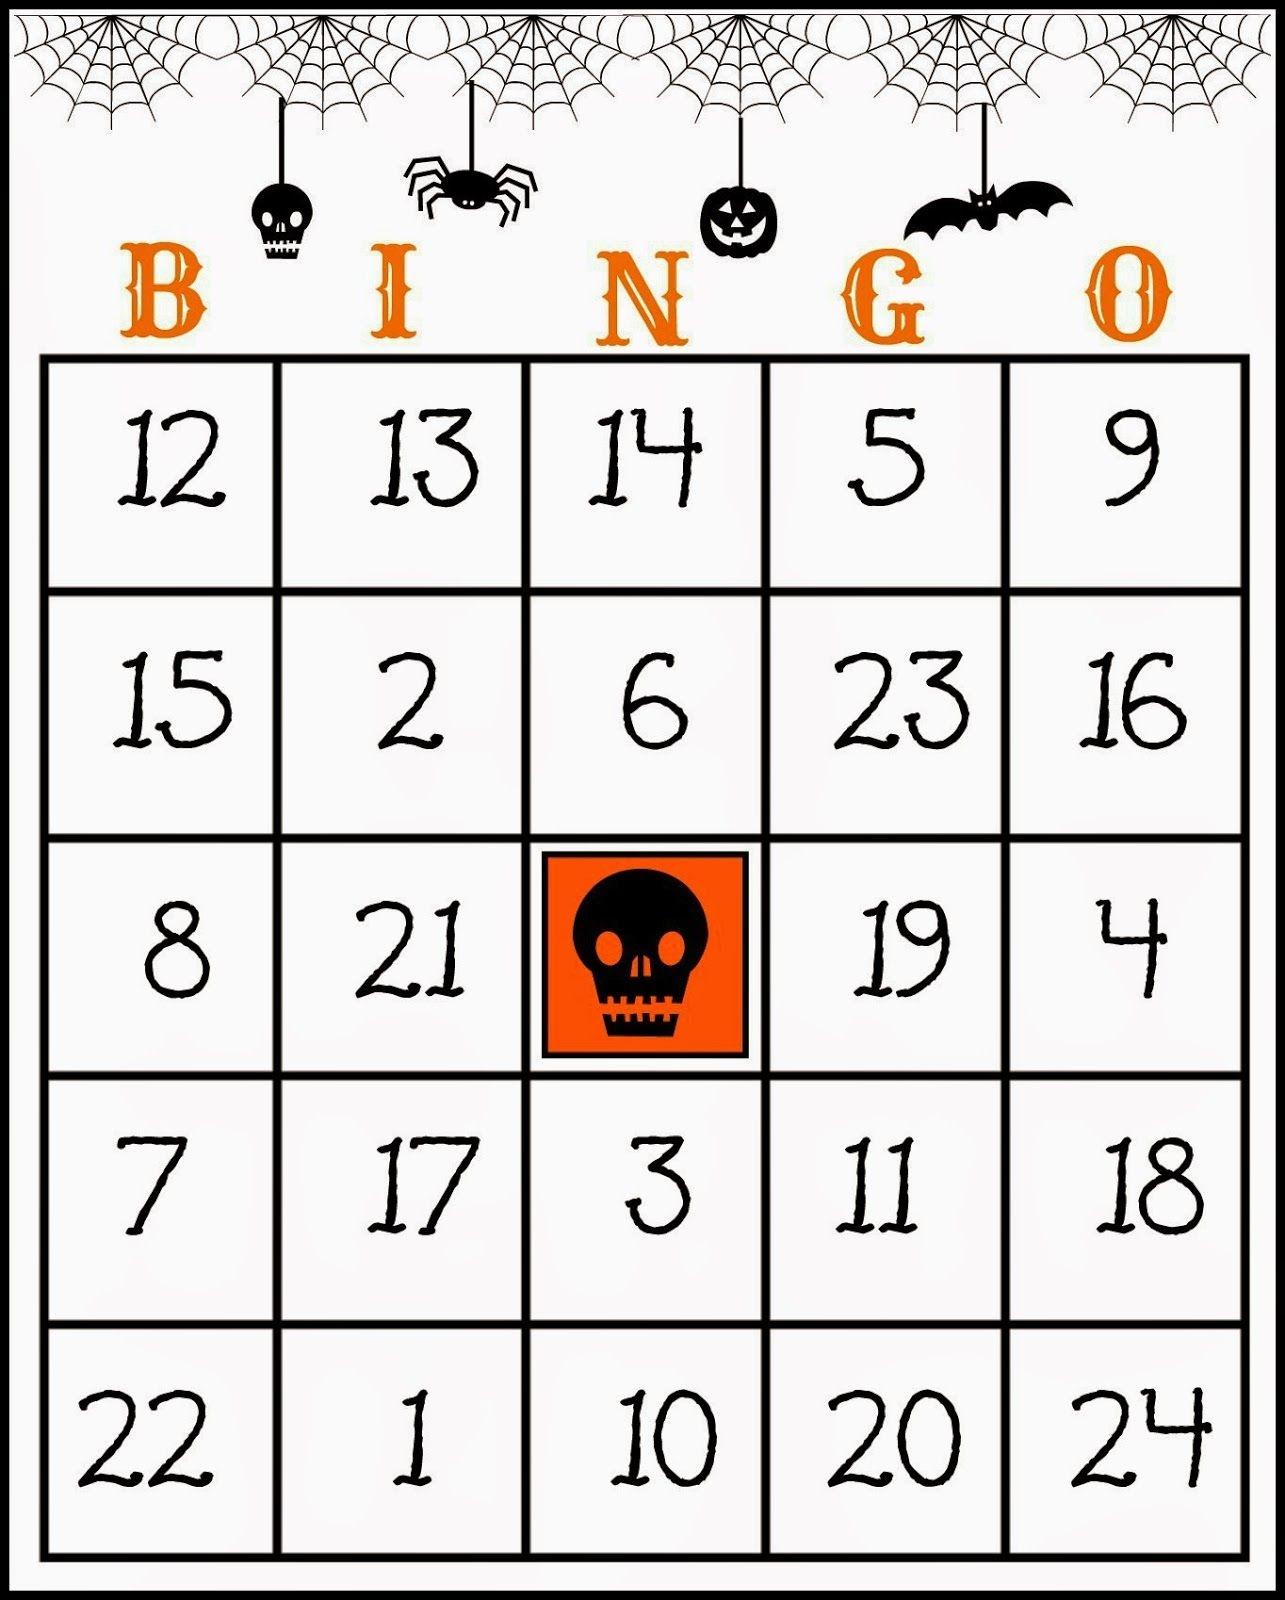 Crafty In Crosby: Free Printable Halloween Bingo Game | Halloween - Free Printable Halloween Bingo Cards